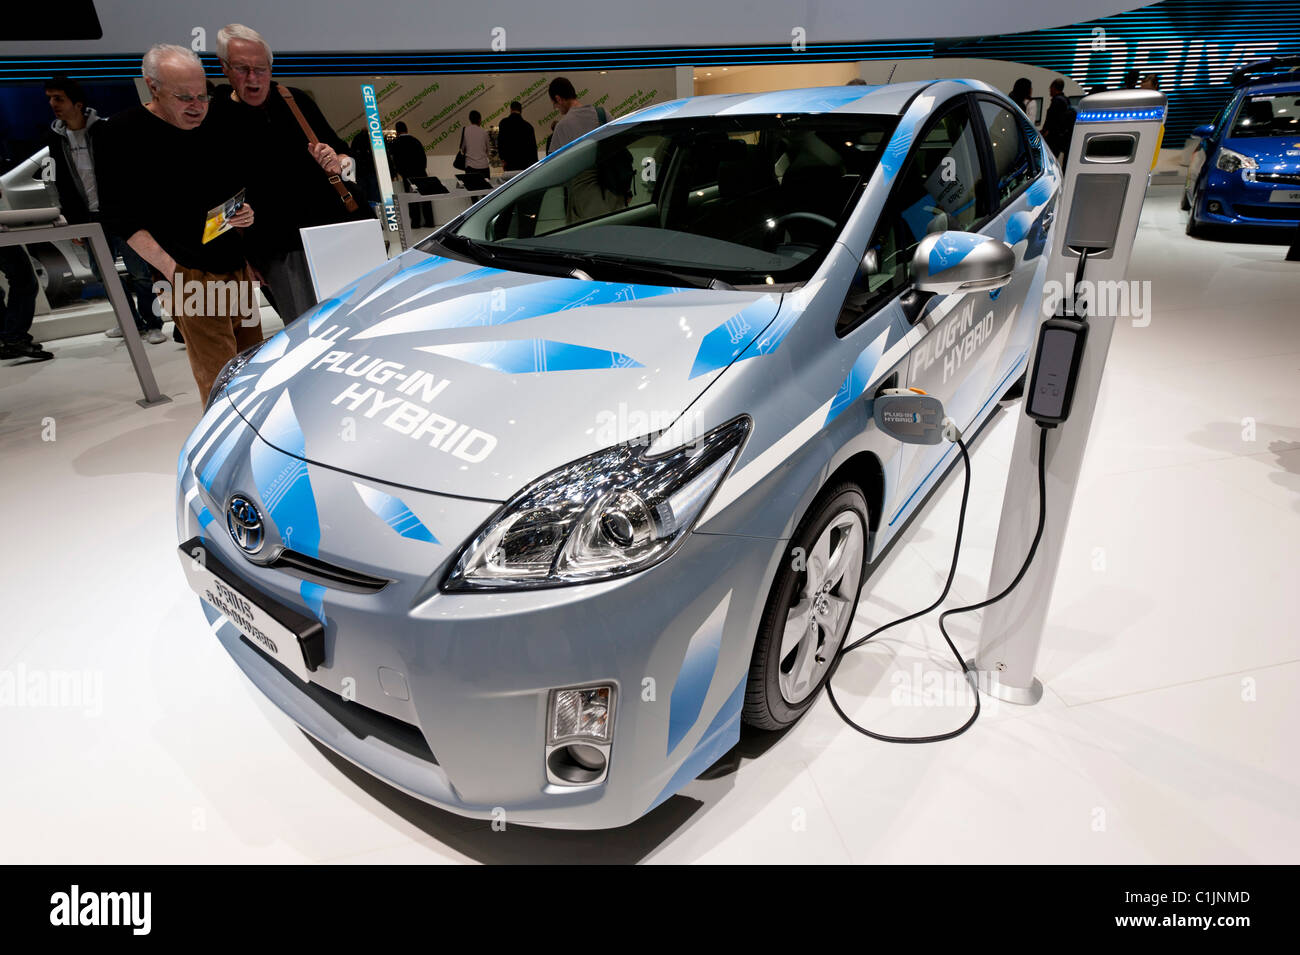 Toyota Prius plug-in Hybrid car at the Geneva Motor Show 2011 Switzerland - Stock Image